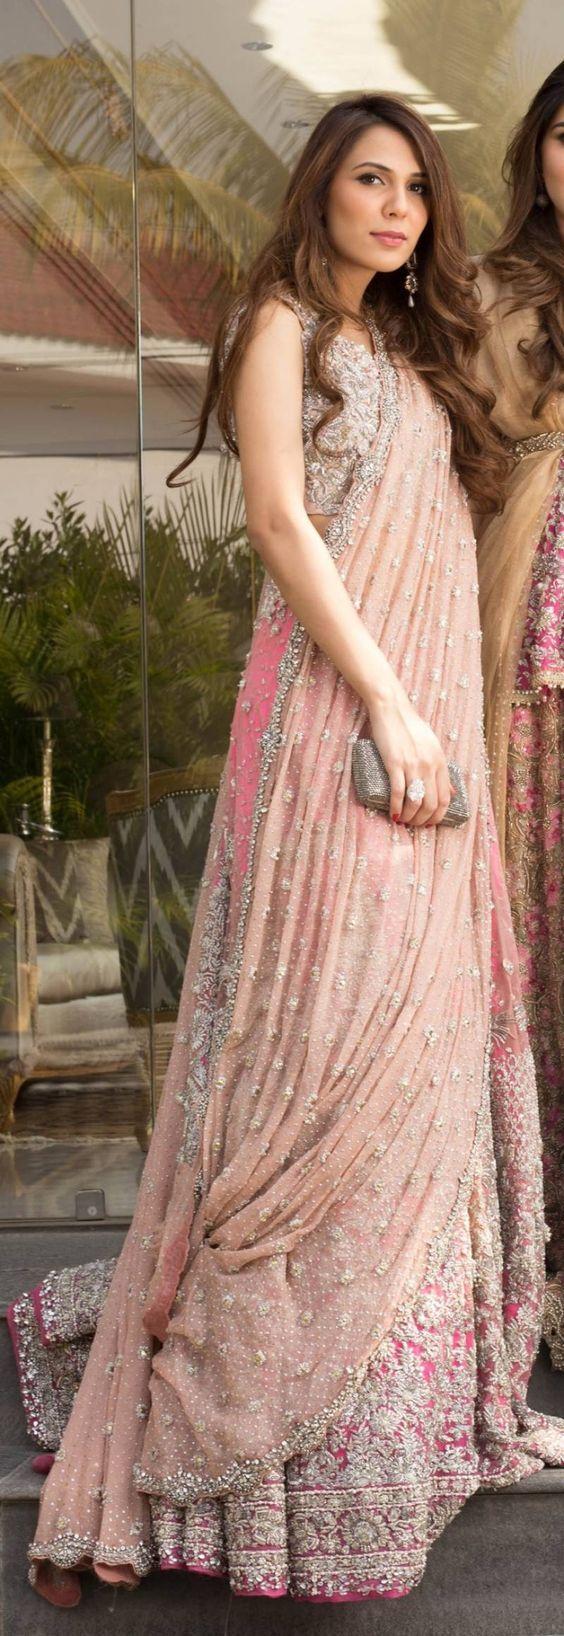 Pin de Nisha Designer en ethenic attire | Pinterest | Bellisima